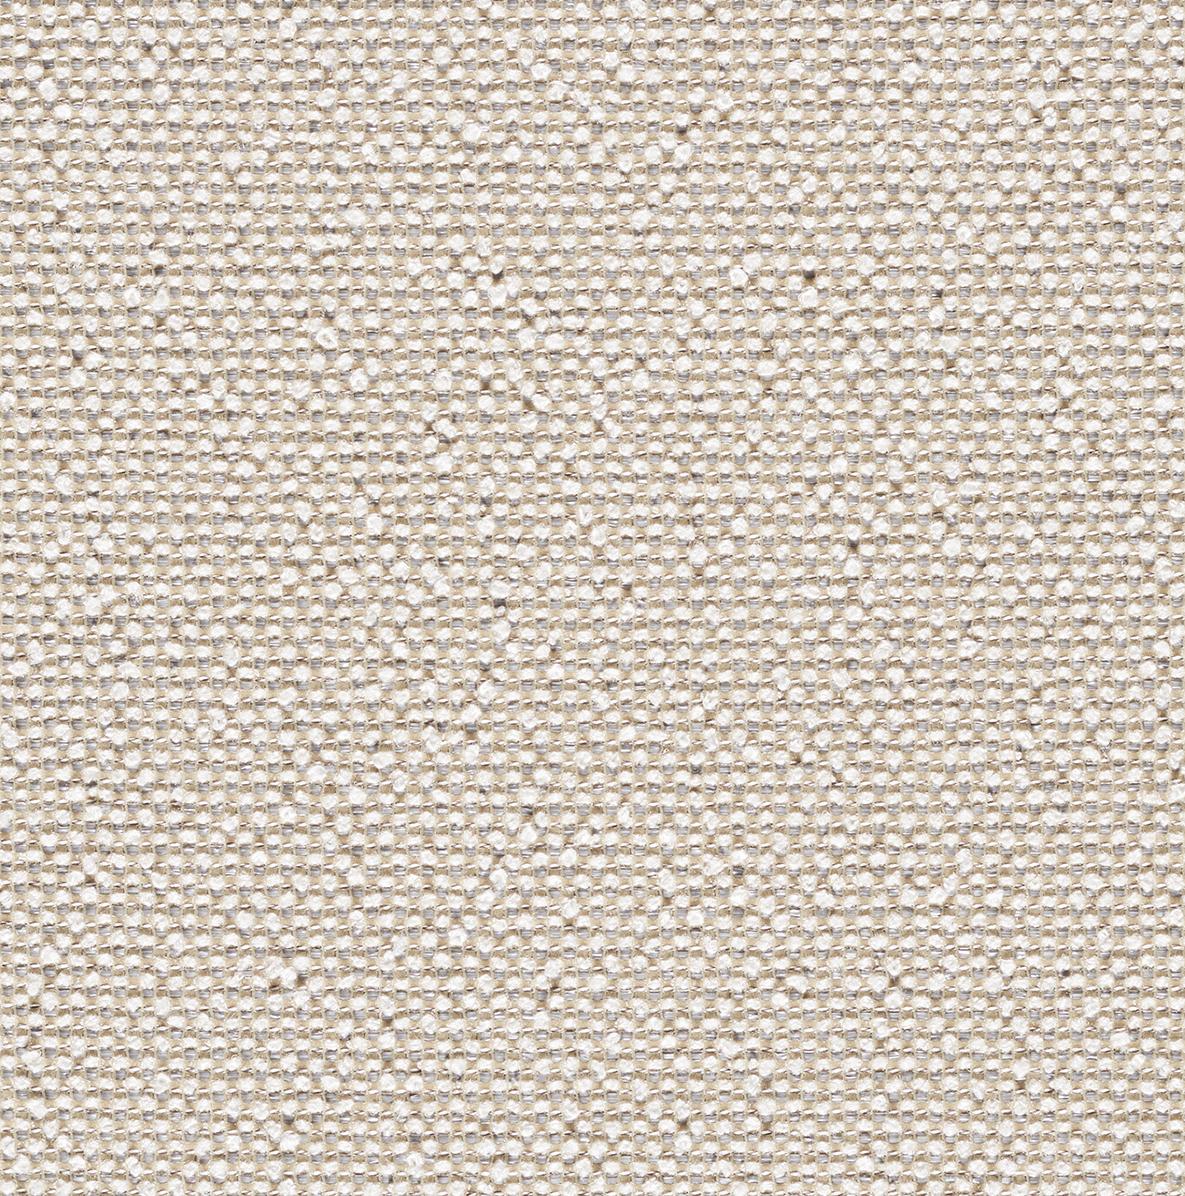 Rhetoric - Nuance - 7017 - 02 Tileable Swatches